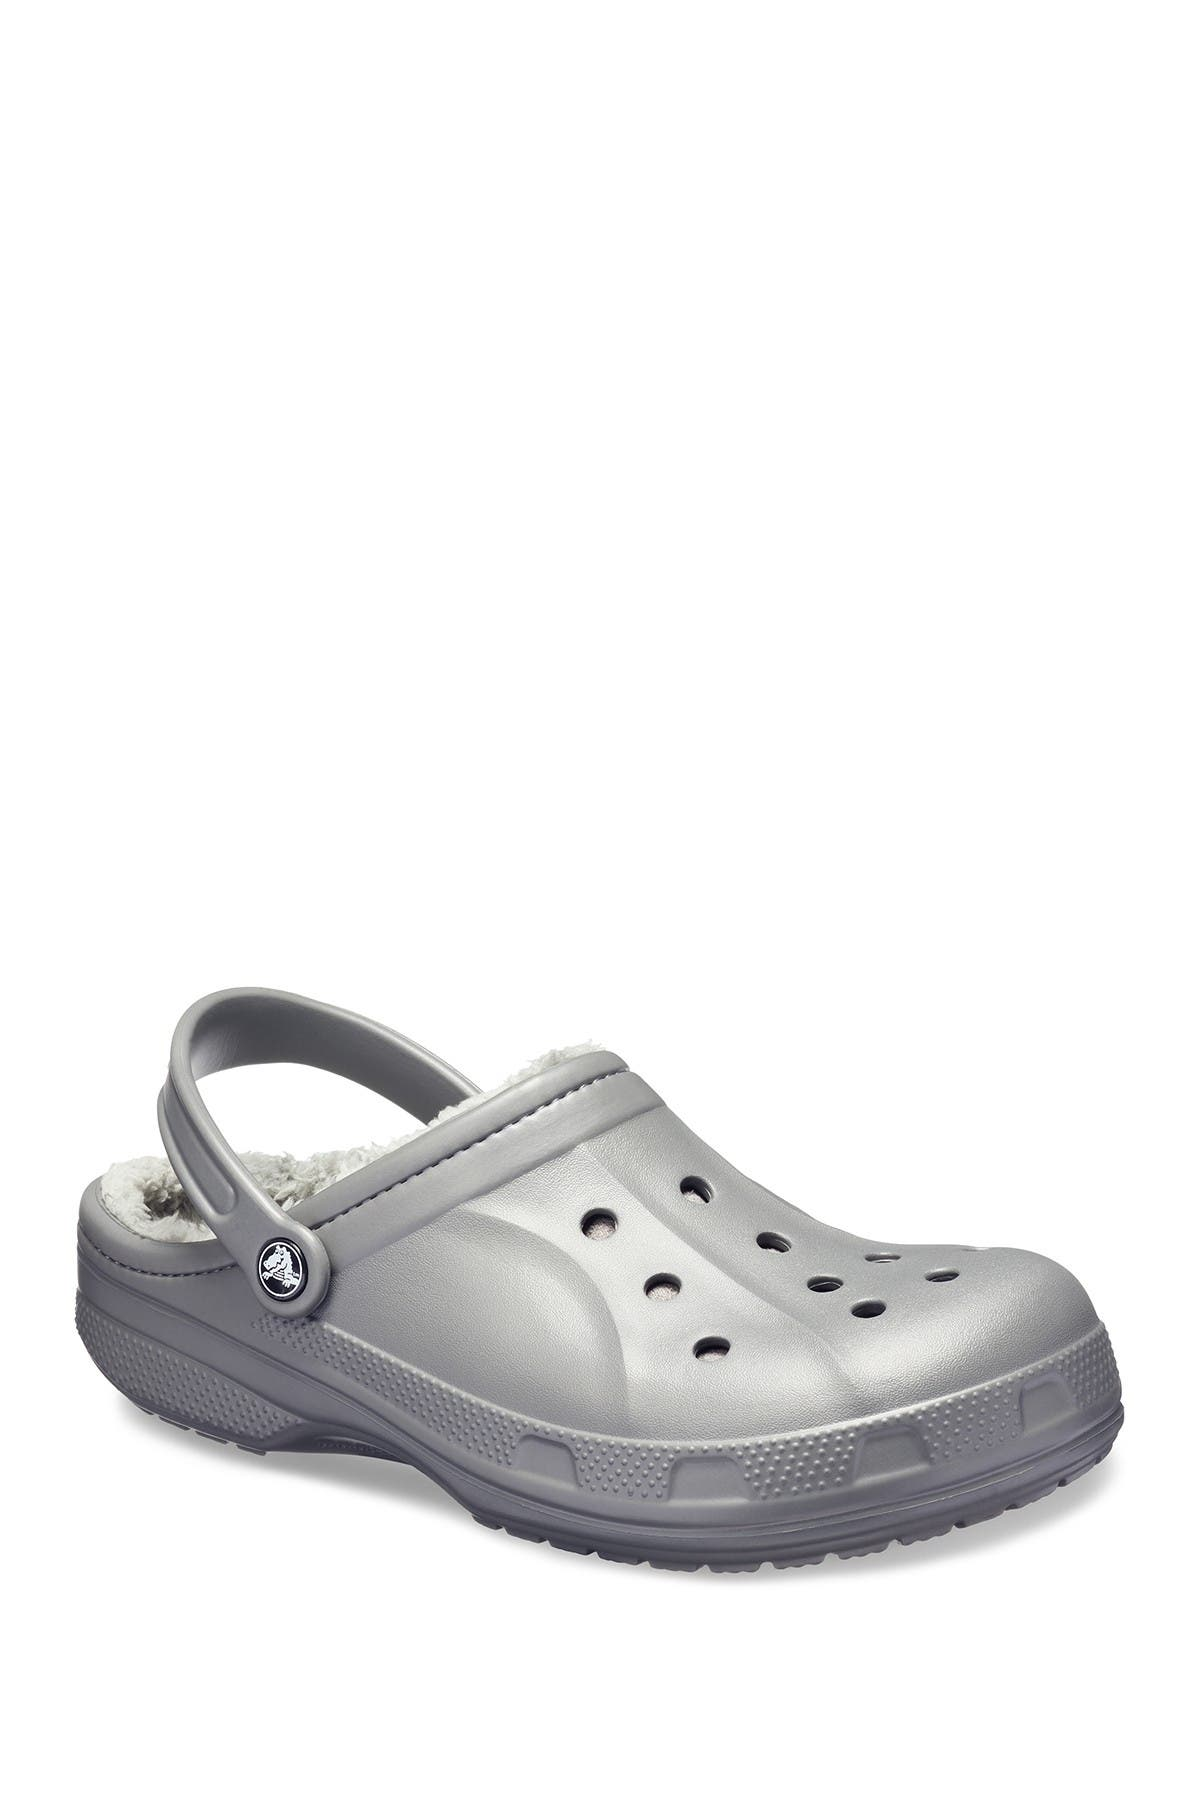 Crocs | Faux Fur Lined Winter Clog